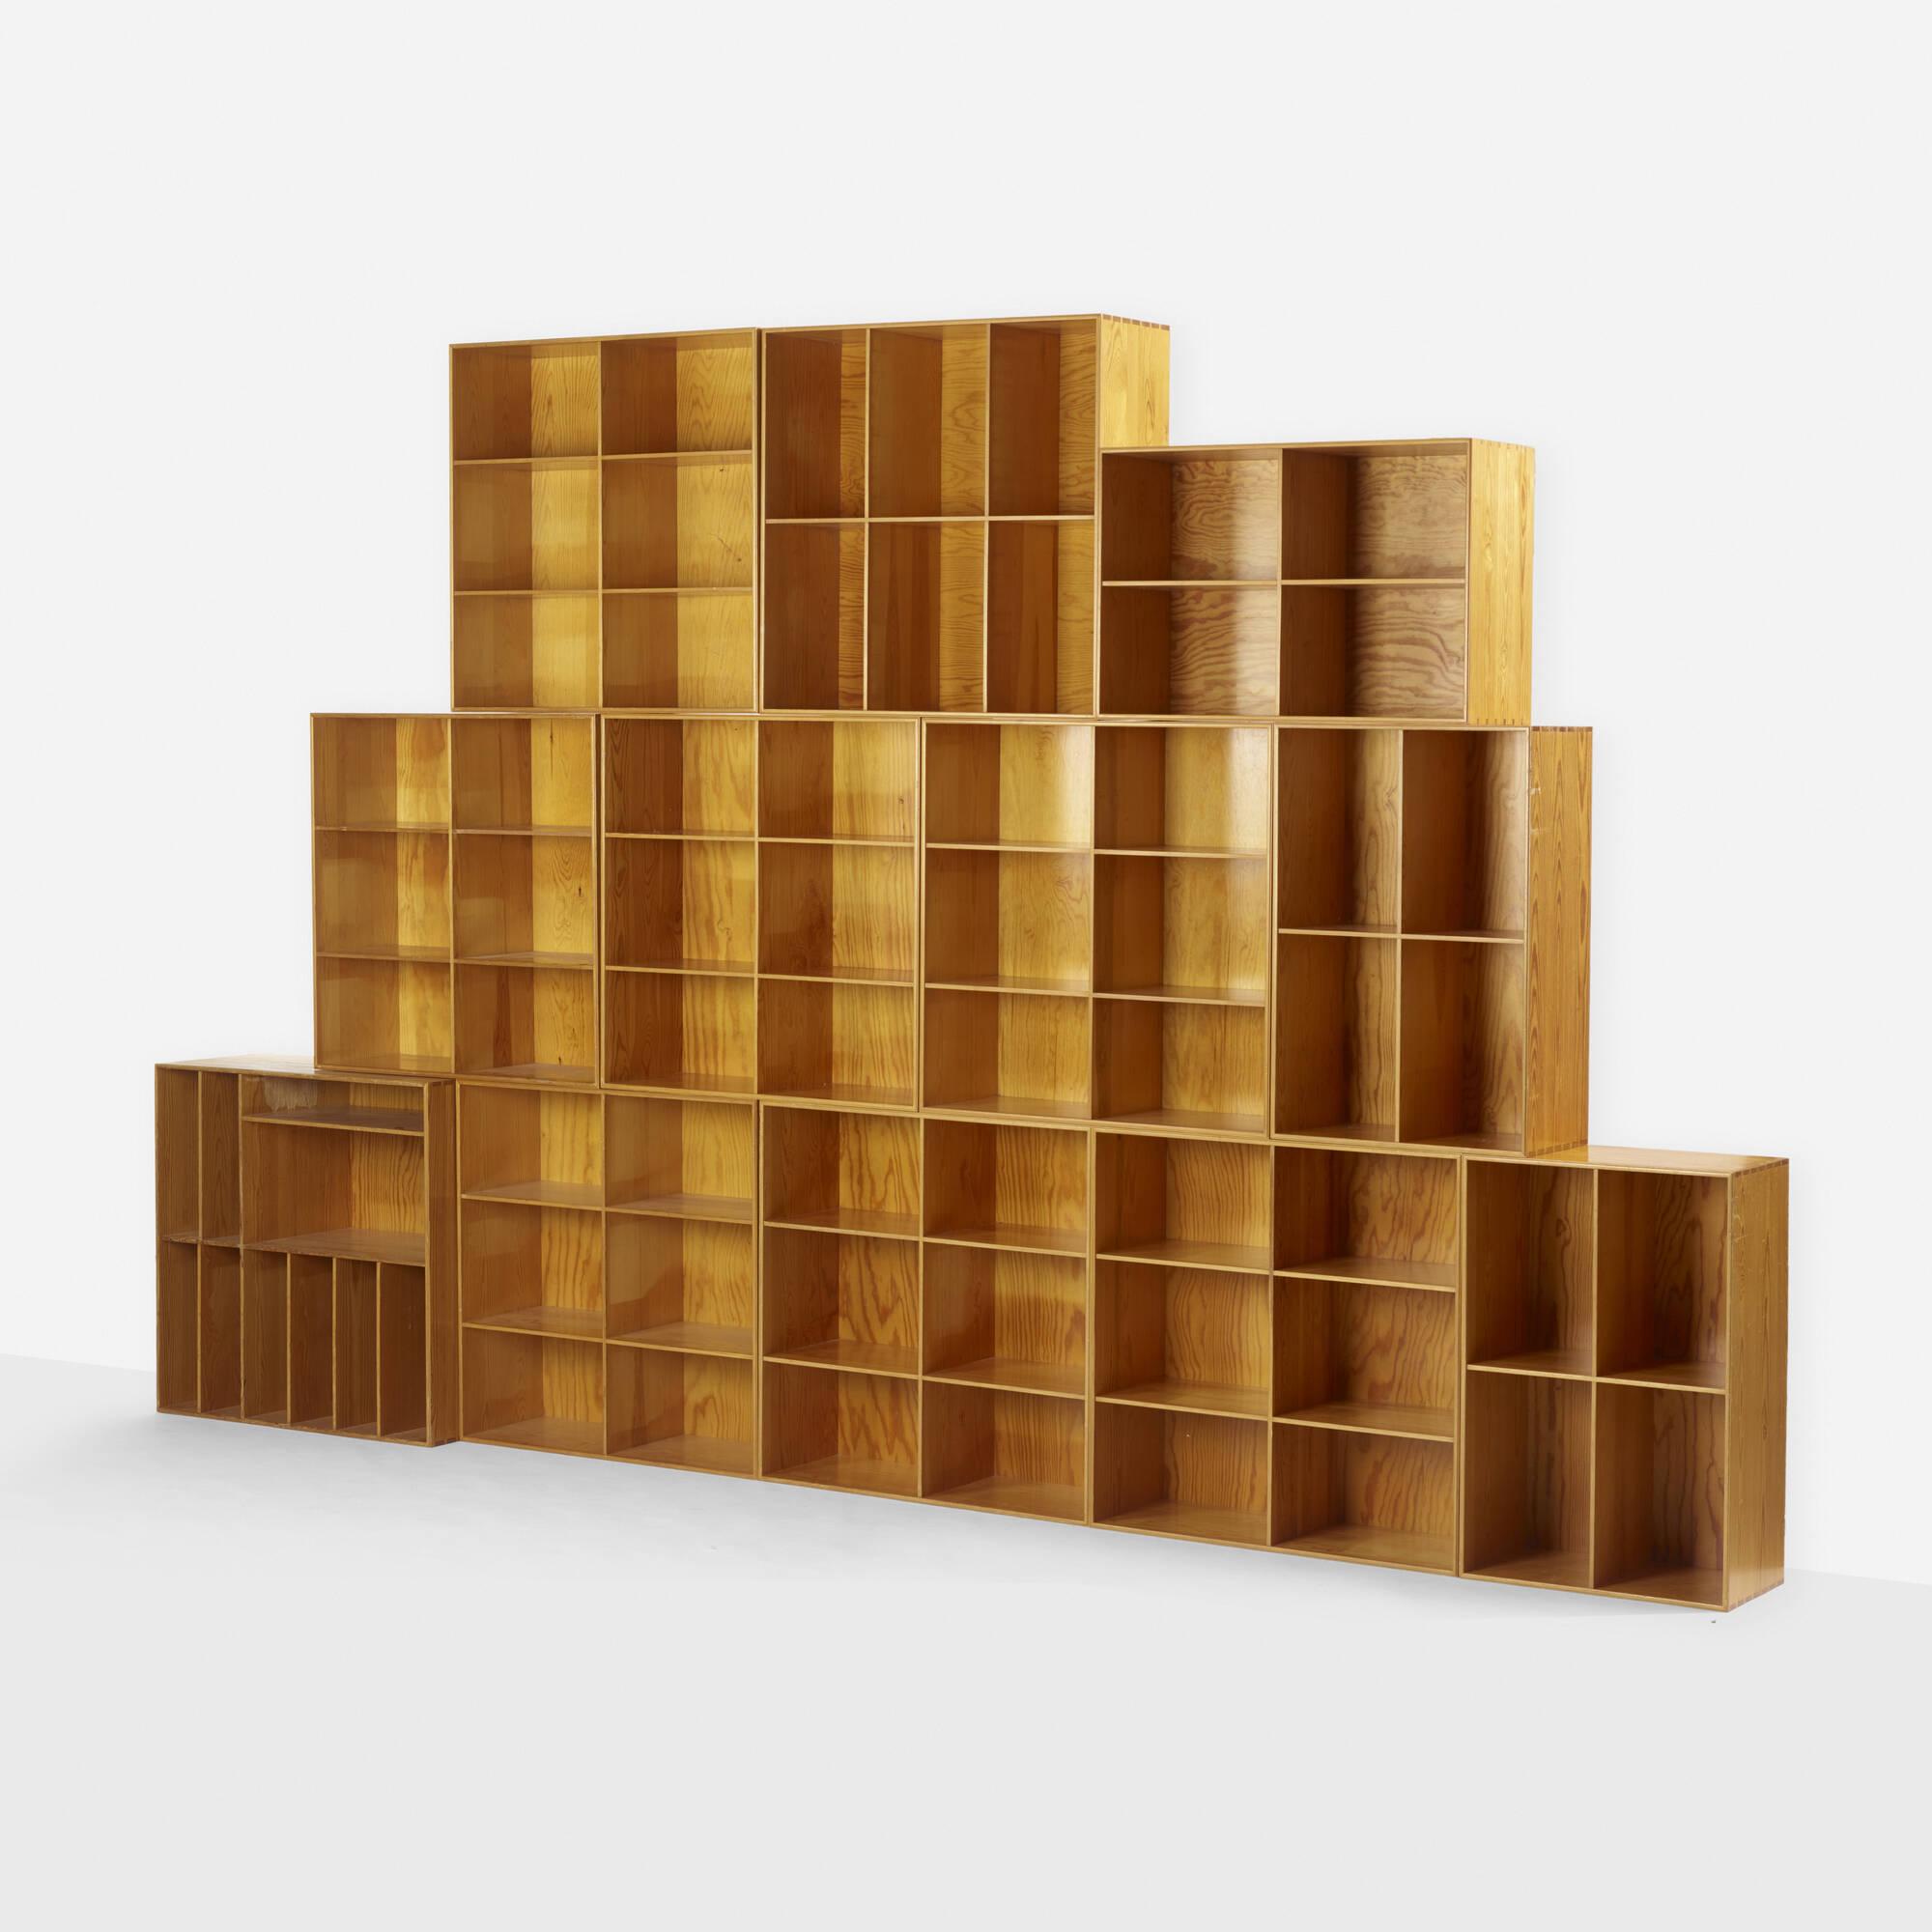 273: Mogens Koch / bookcases, set of twelve (1 of 4)